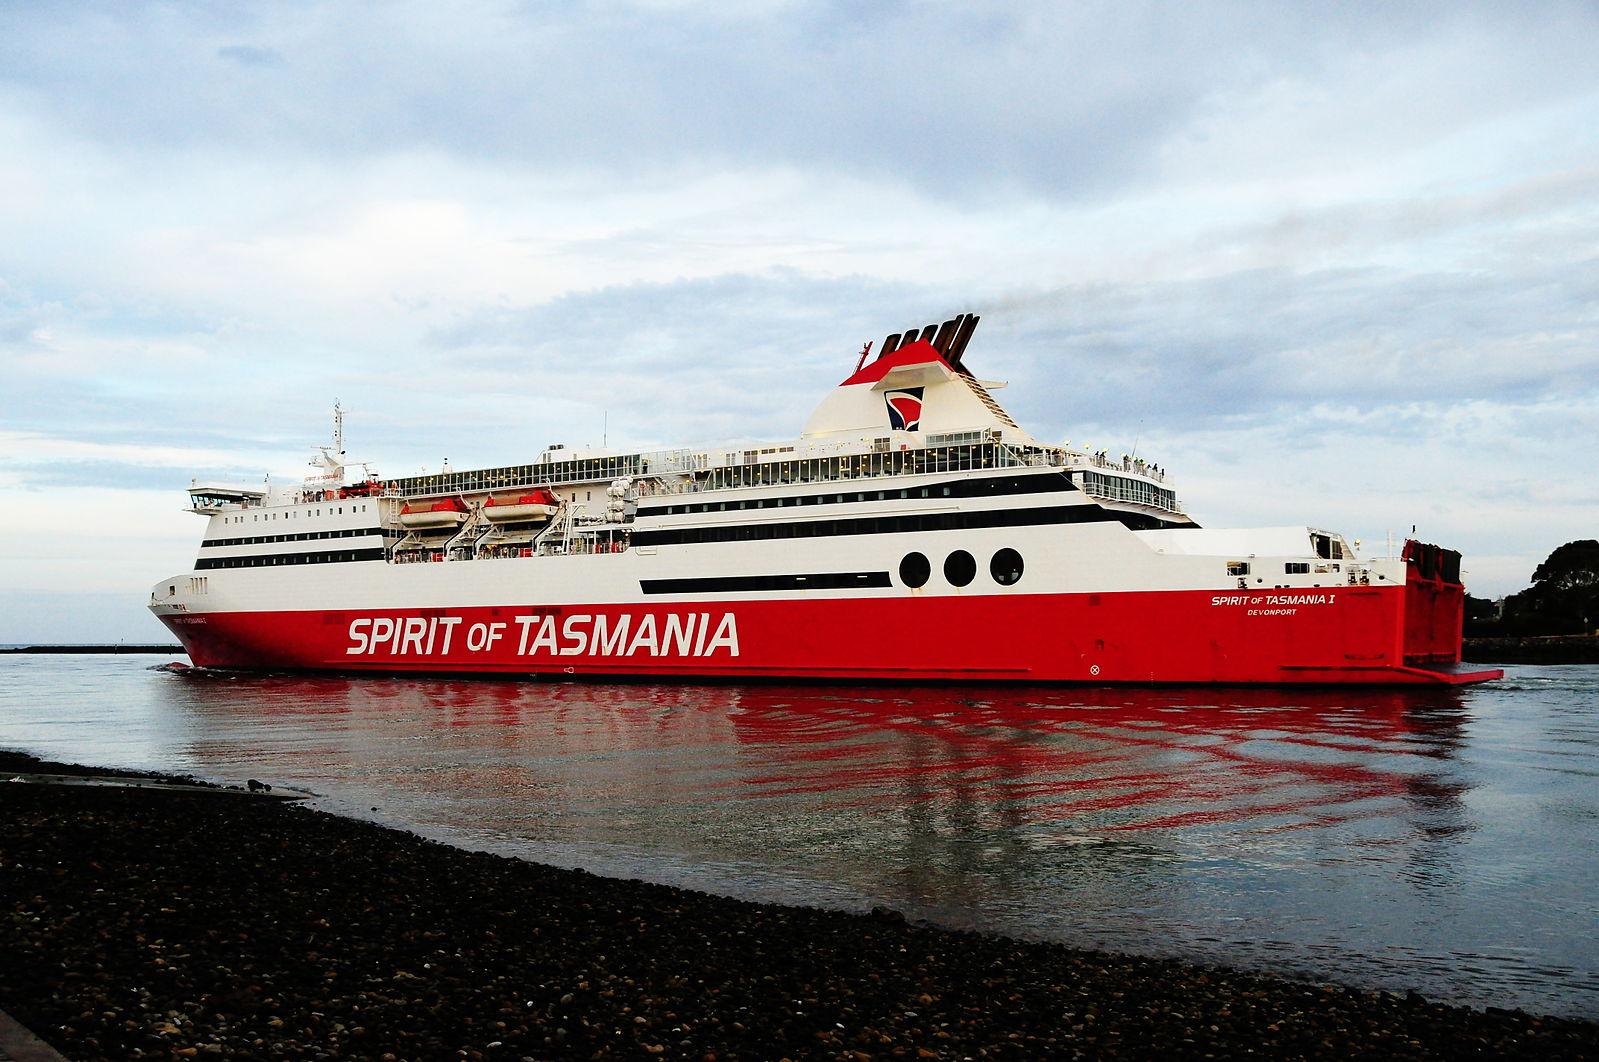 Spirit-of-Tasmania.jpg